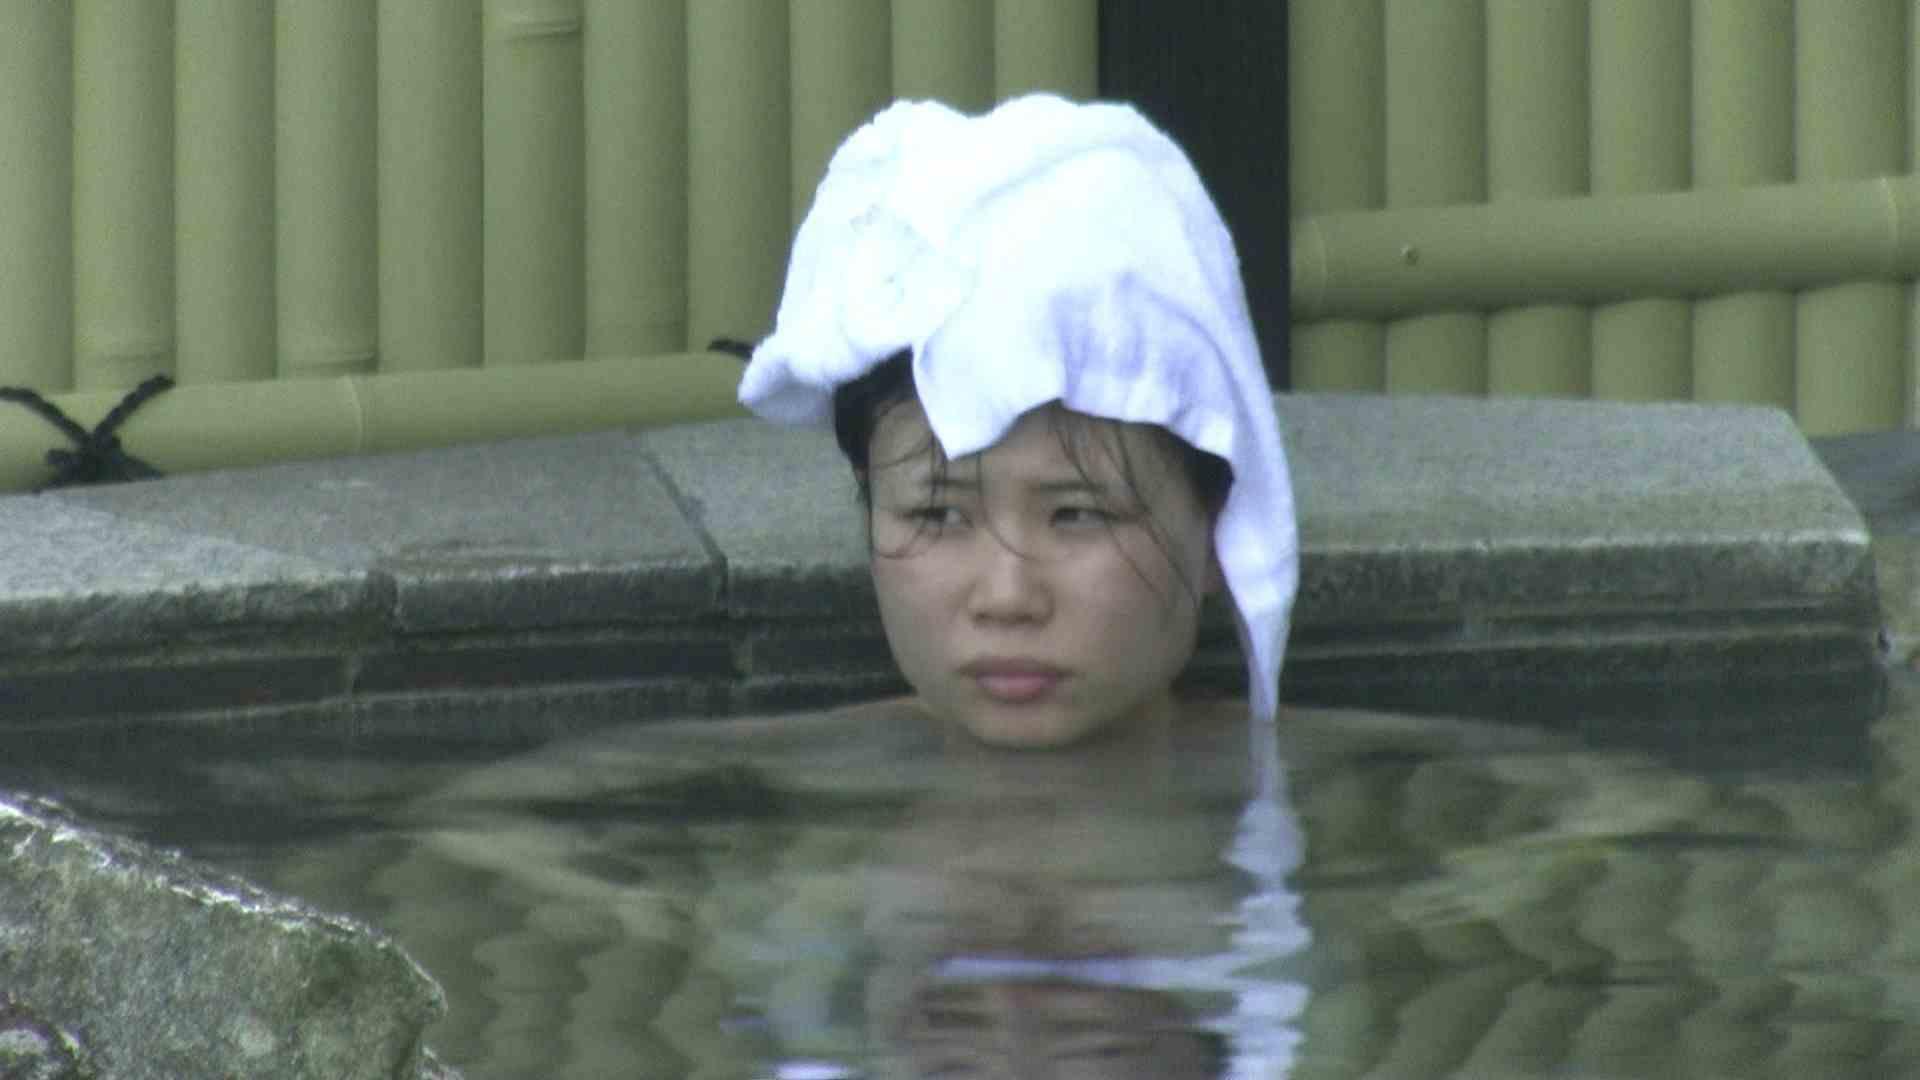 Aquaな露天風呂Vol.183 盗撮師作品 エロ無料画像 105pic 86